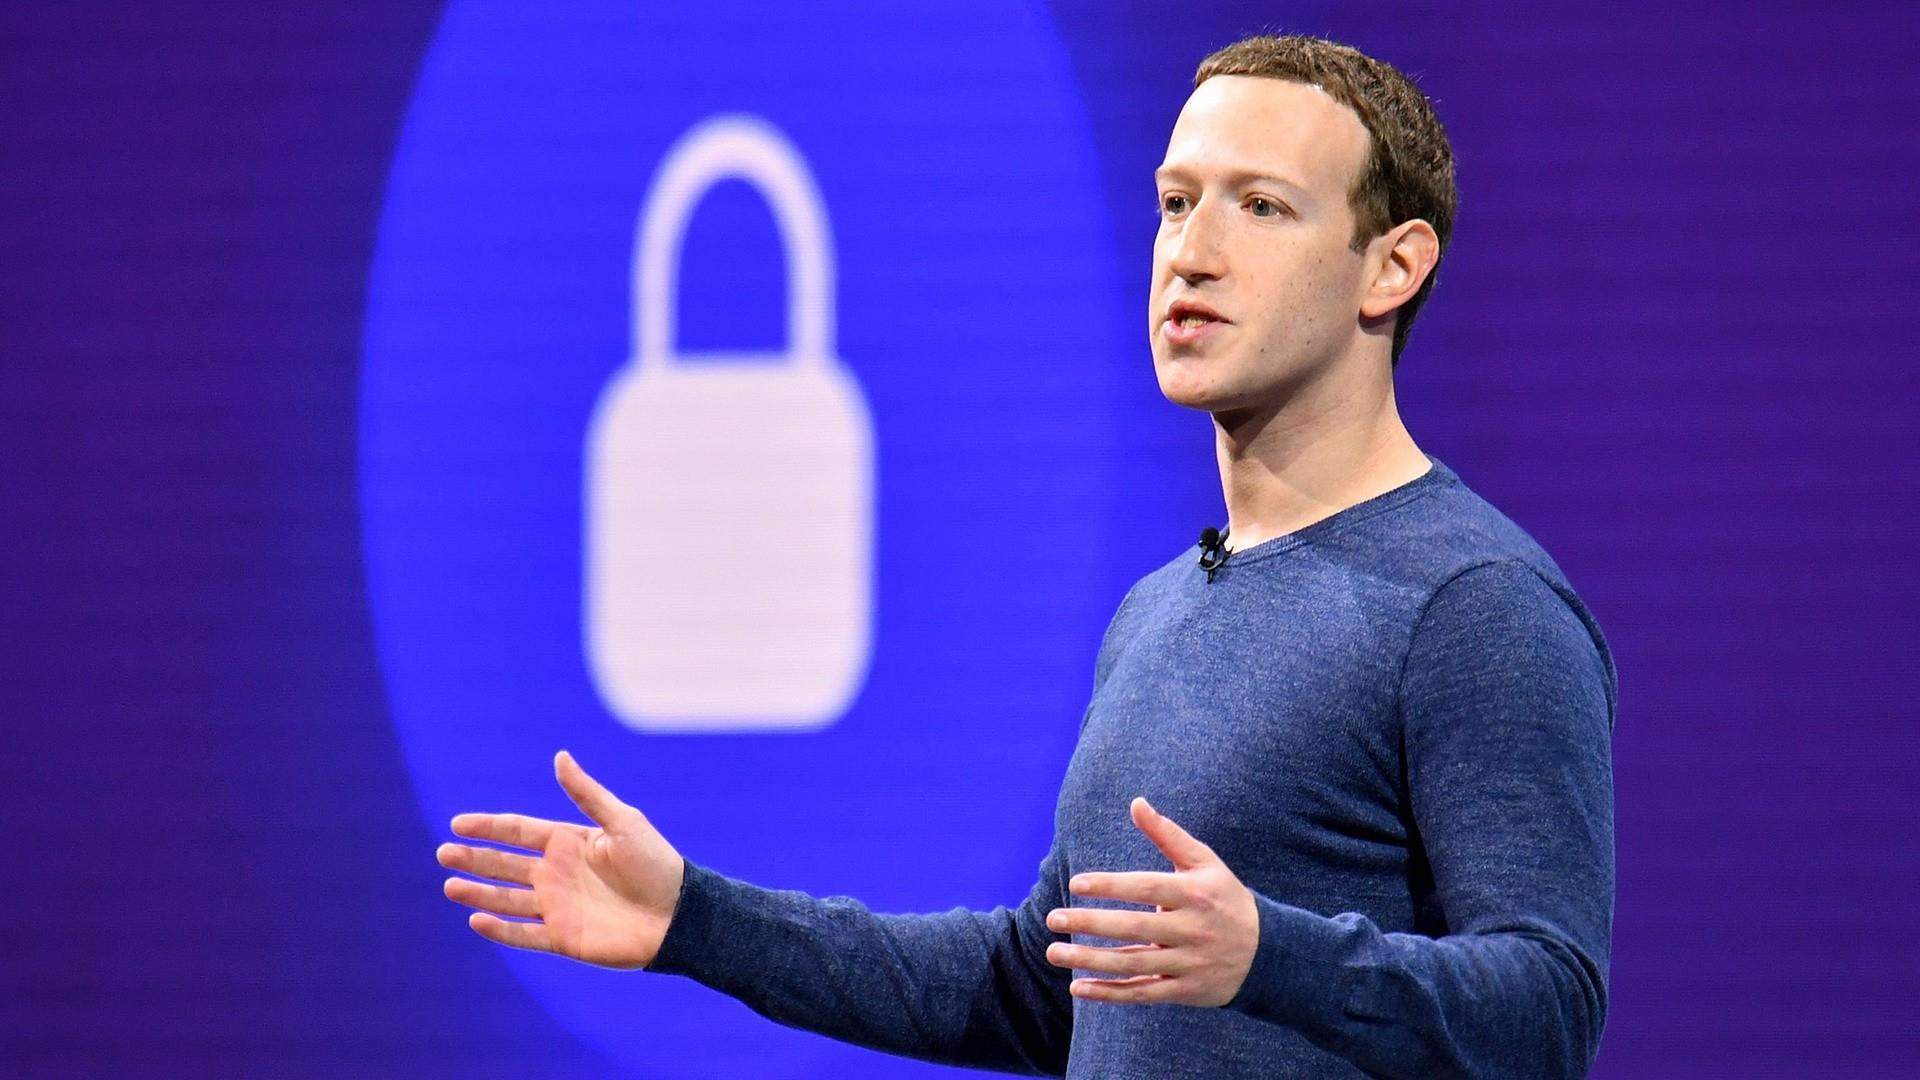 Mark Zuckerberg leveraged Facebook user data to fight rivals and